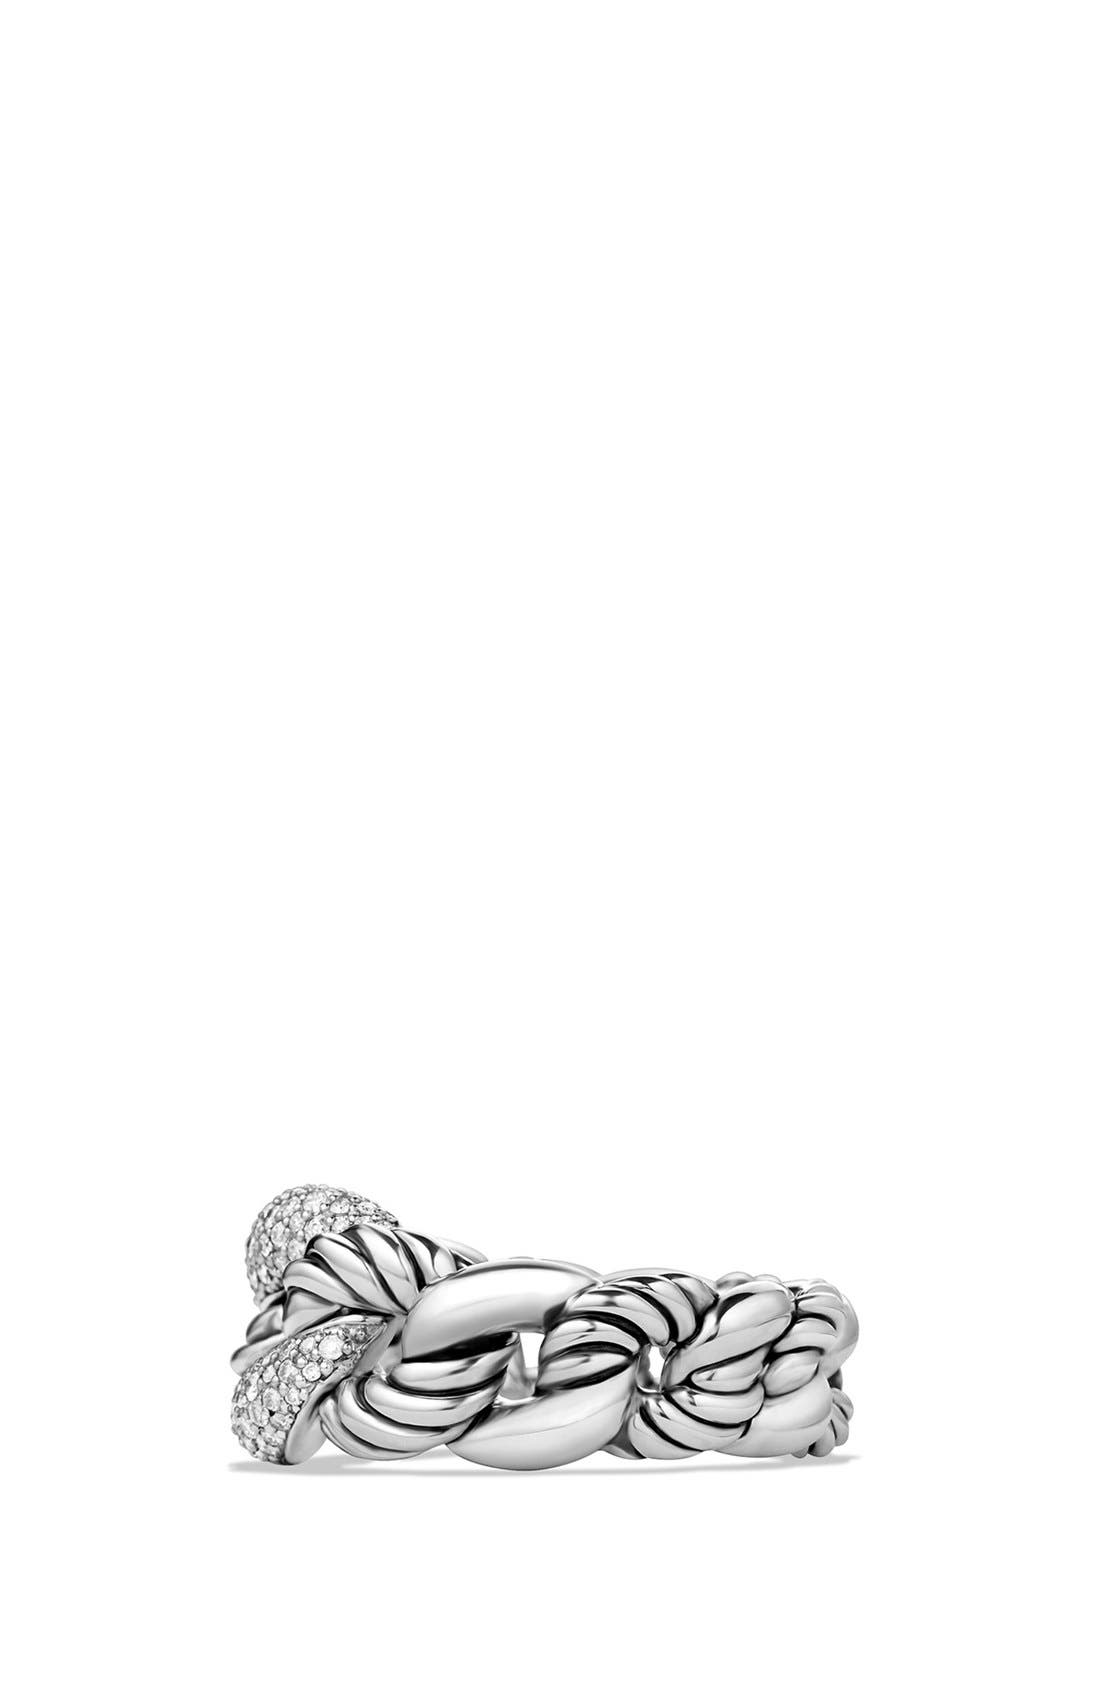 Alternate Image 3  - David Yurman'Belmont' Curb Link Ring with Diamonds